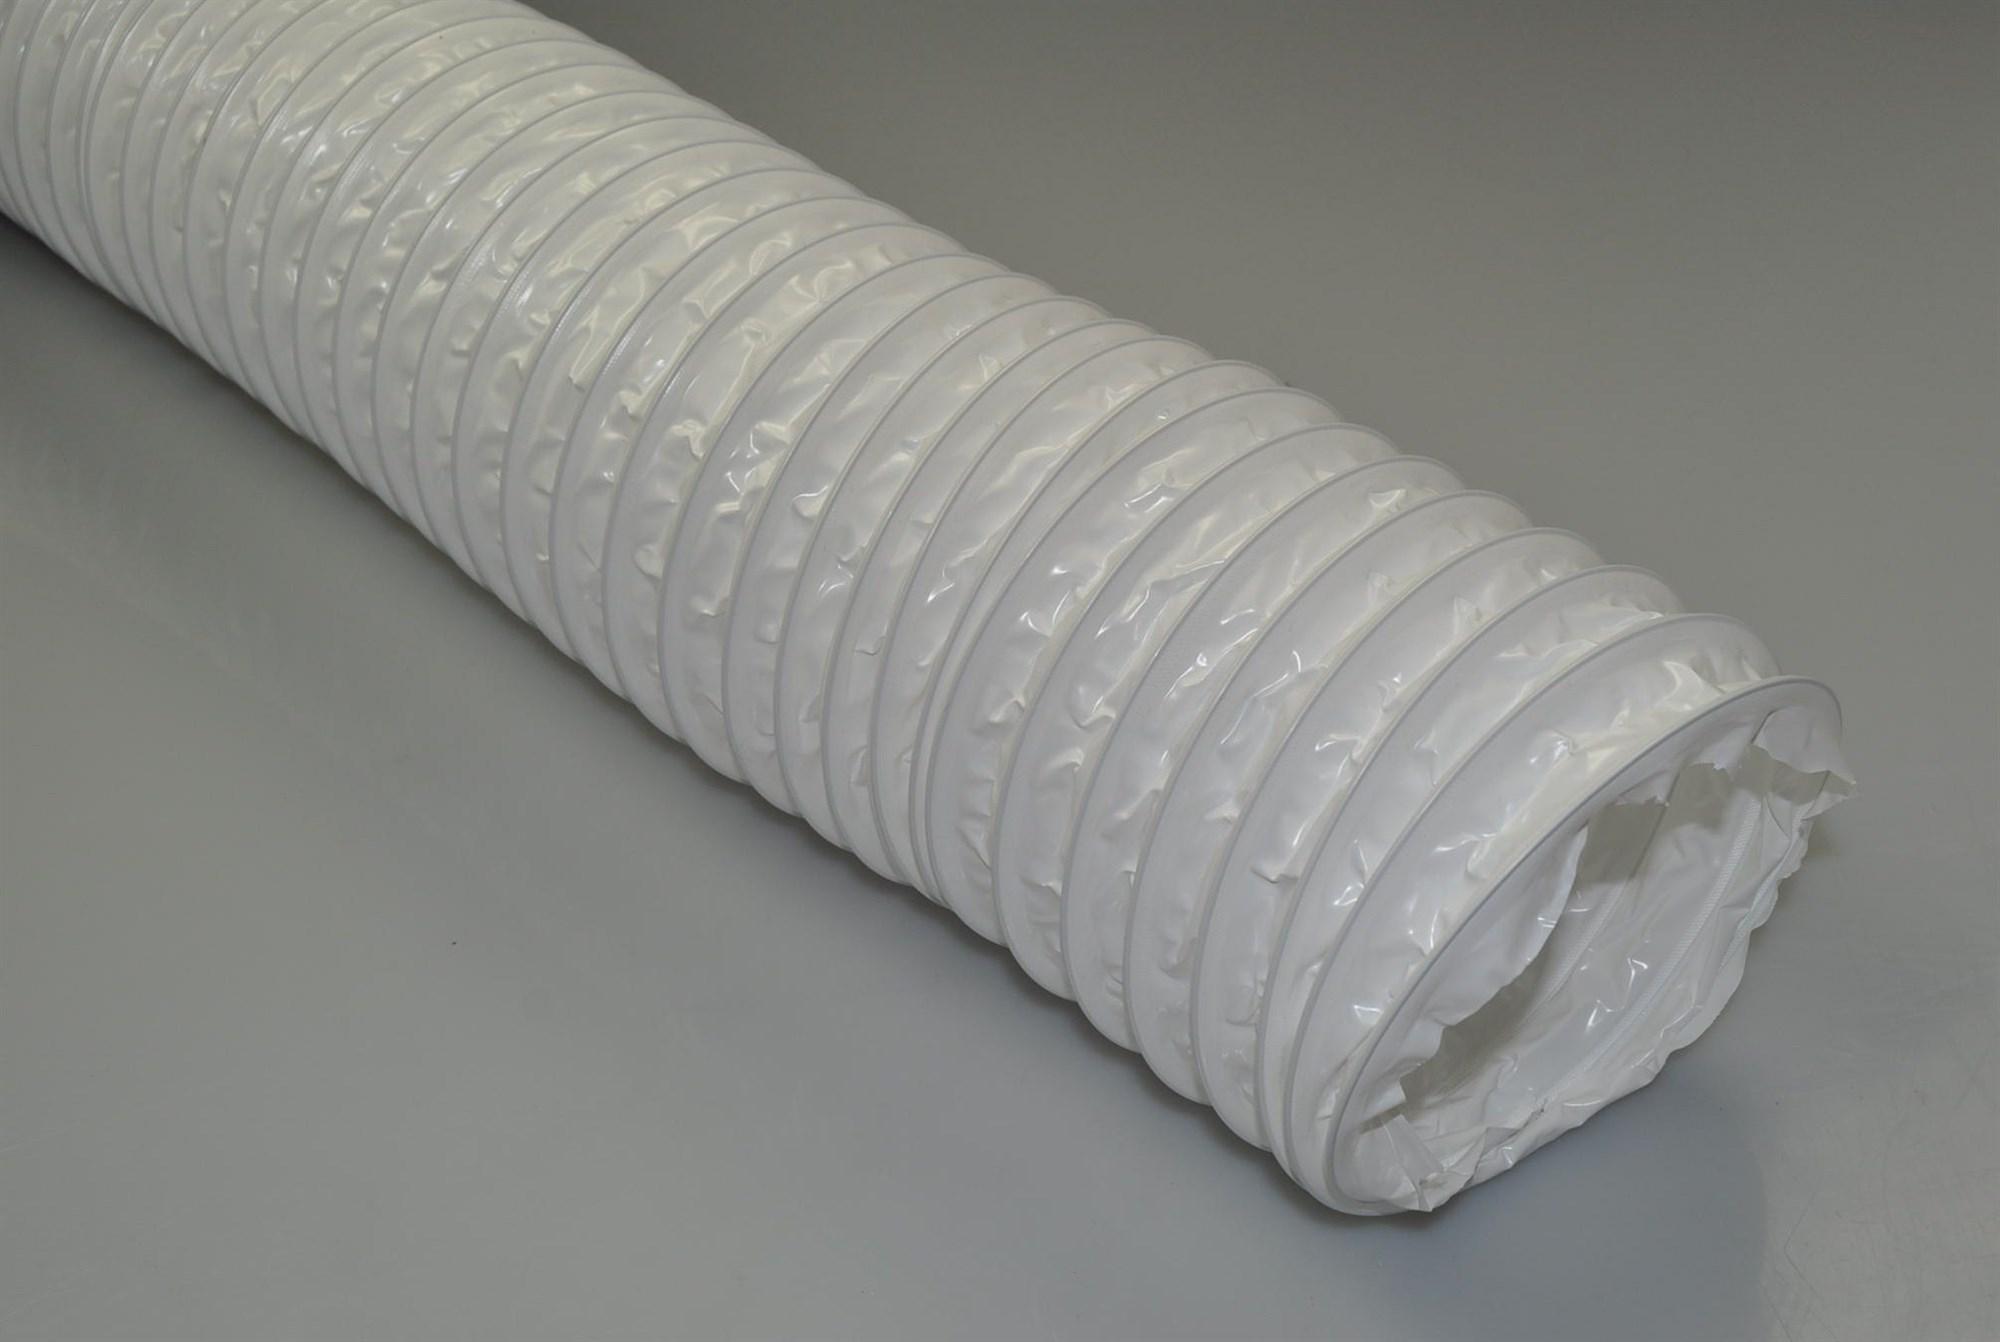 Abluftschlauch Universal Dunstabzugshaube 150 Mm Flexibel